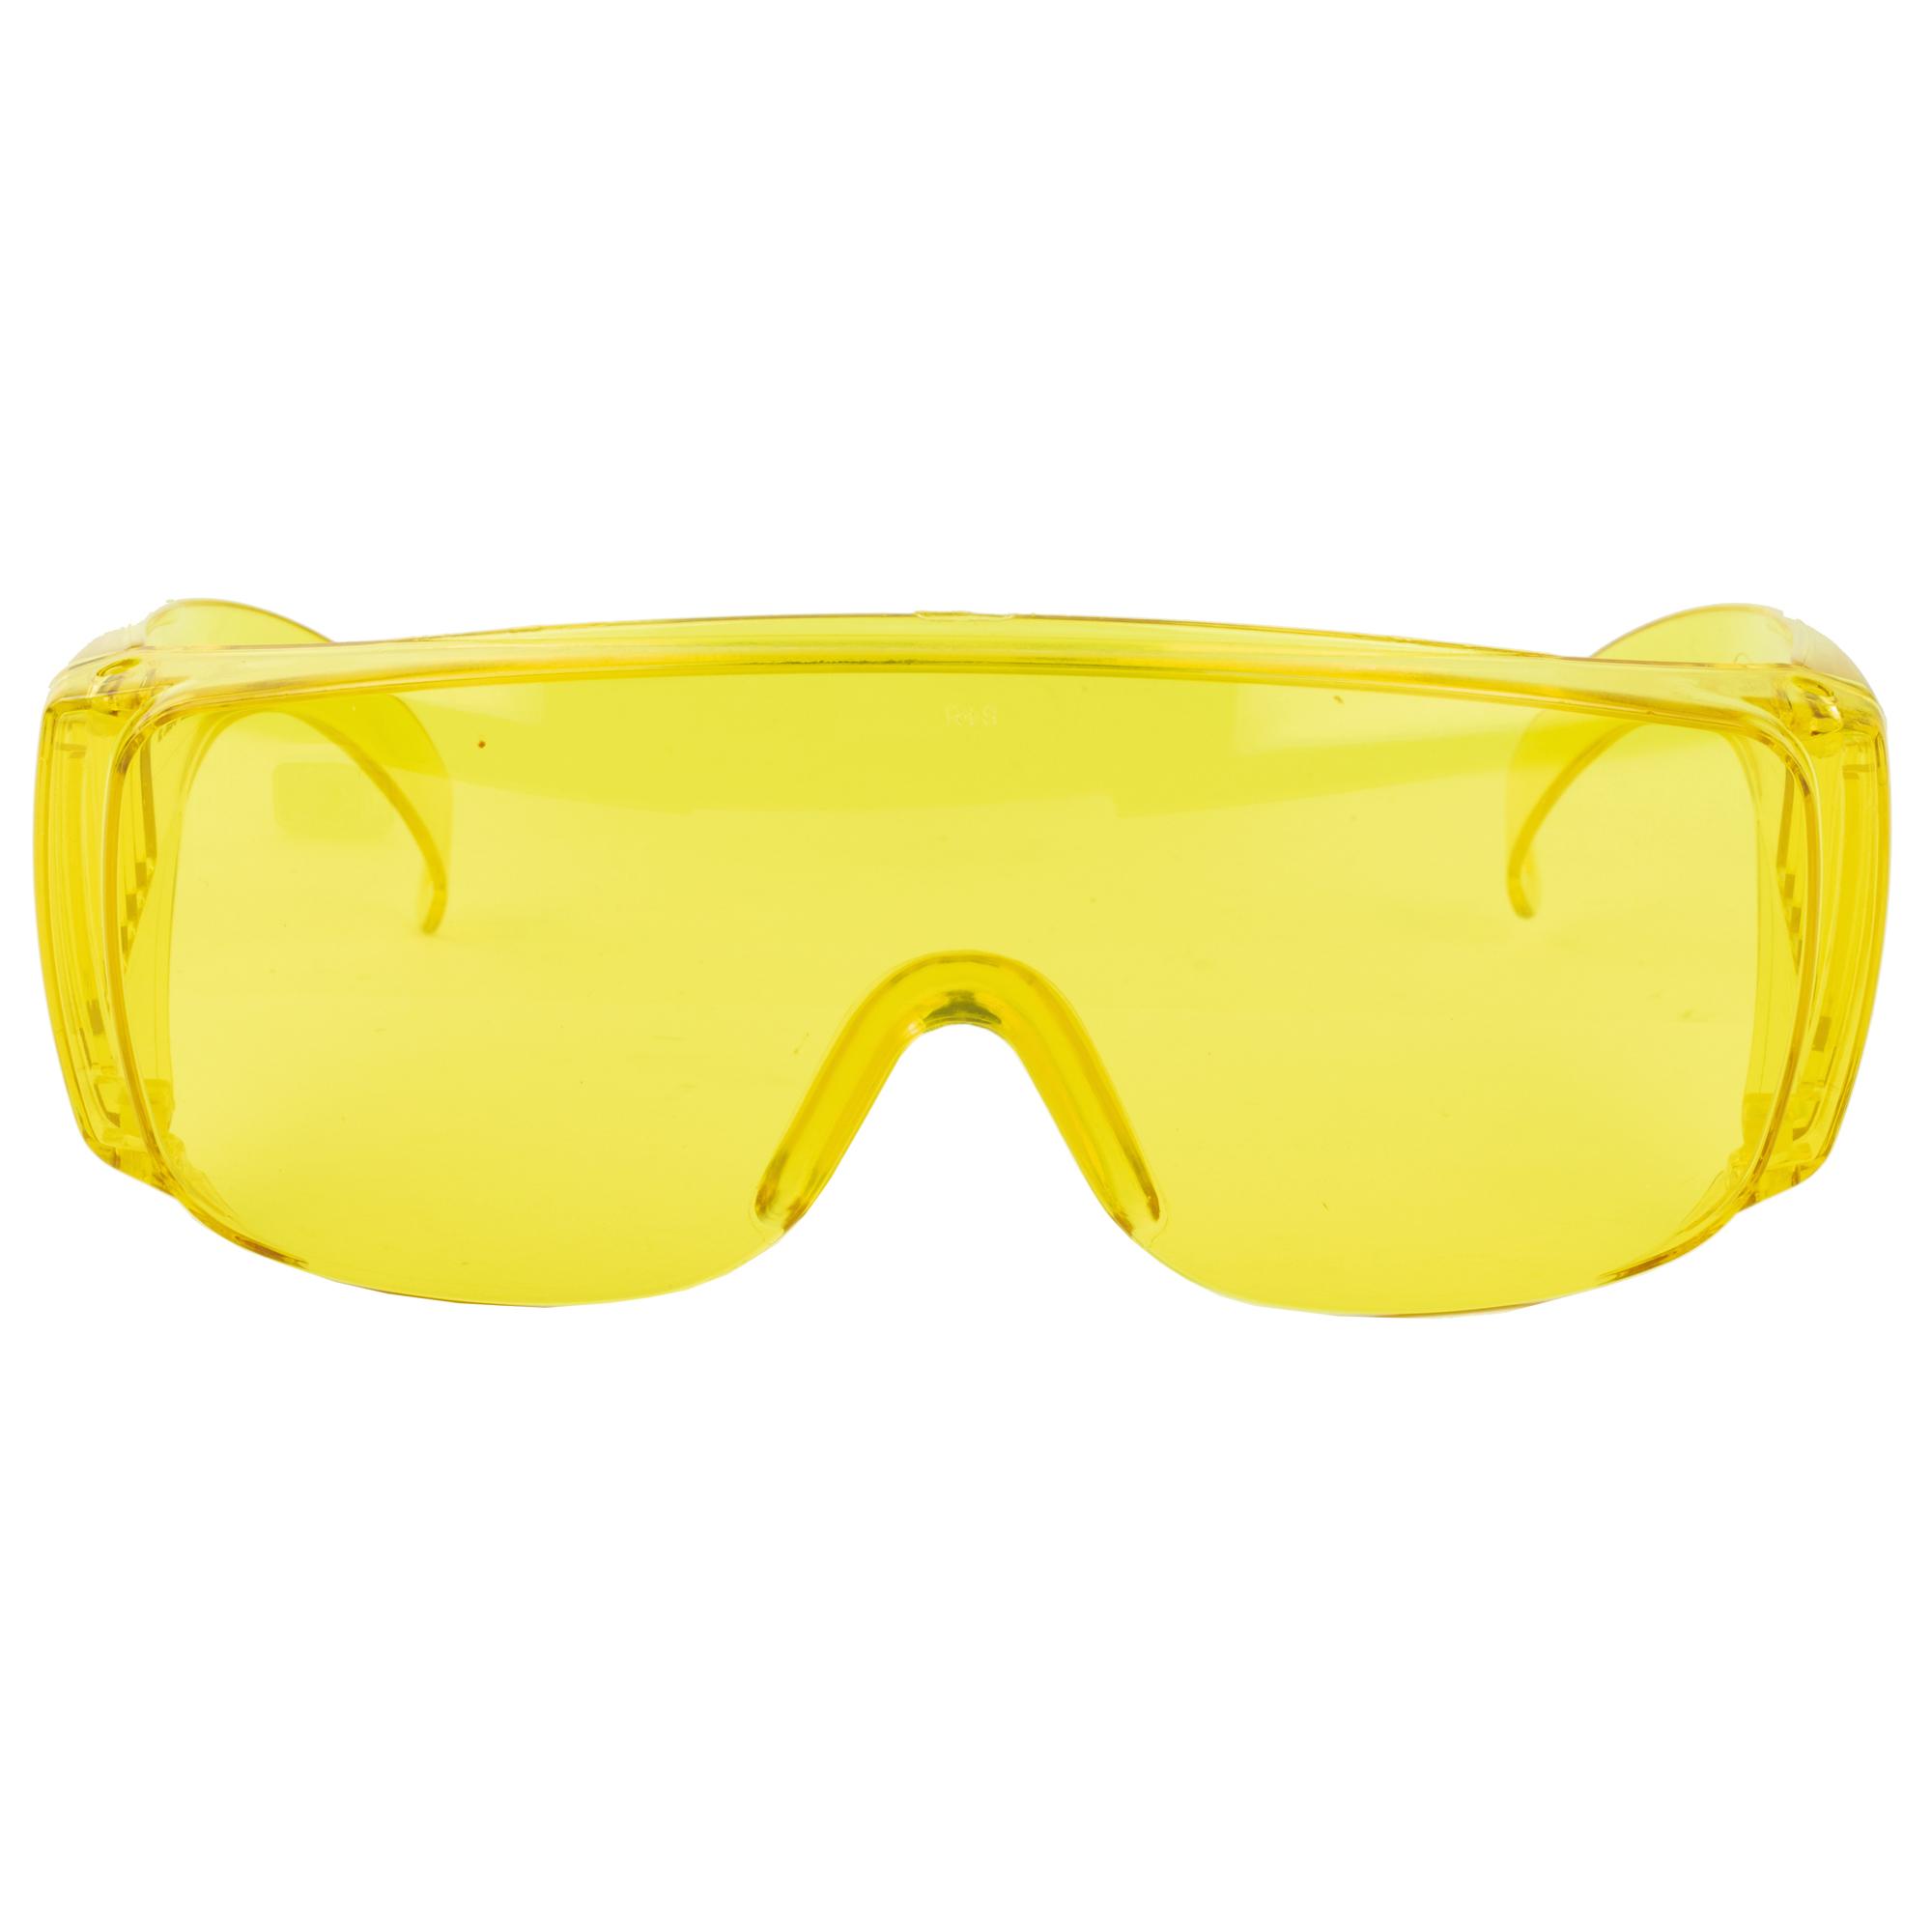 Radians Coveralls Amber Glasses Cvrs